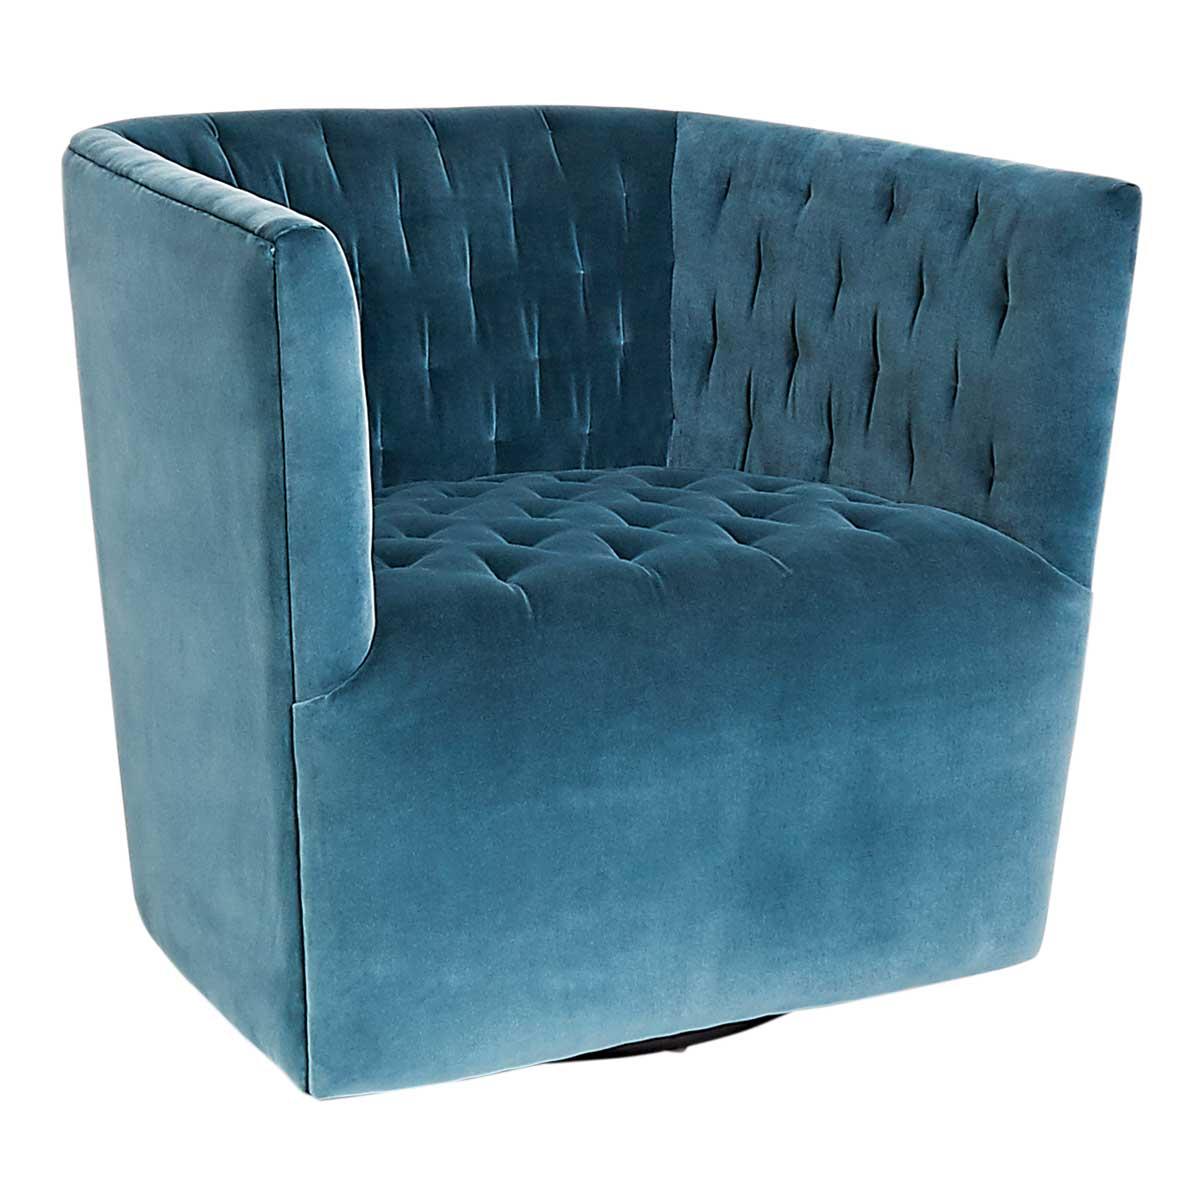 Vertigo-cotton-velvet-club-chair